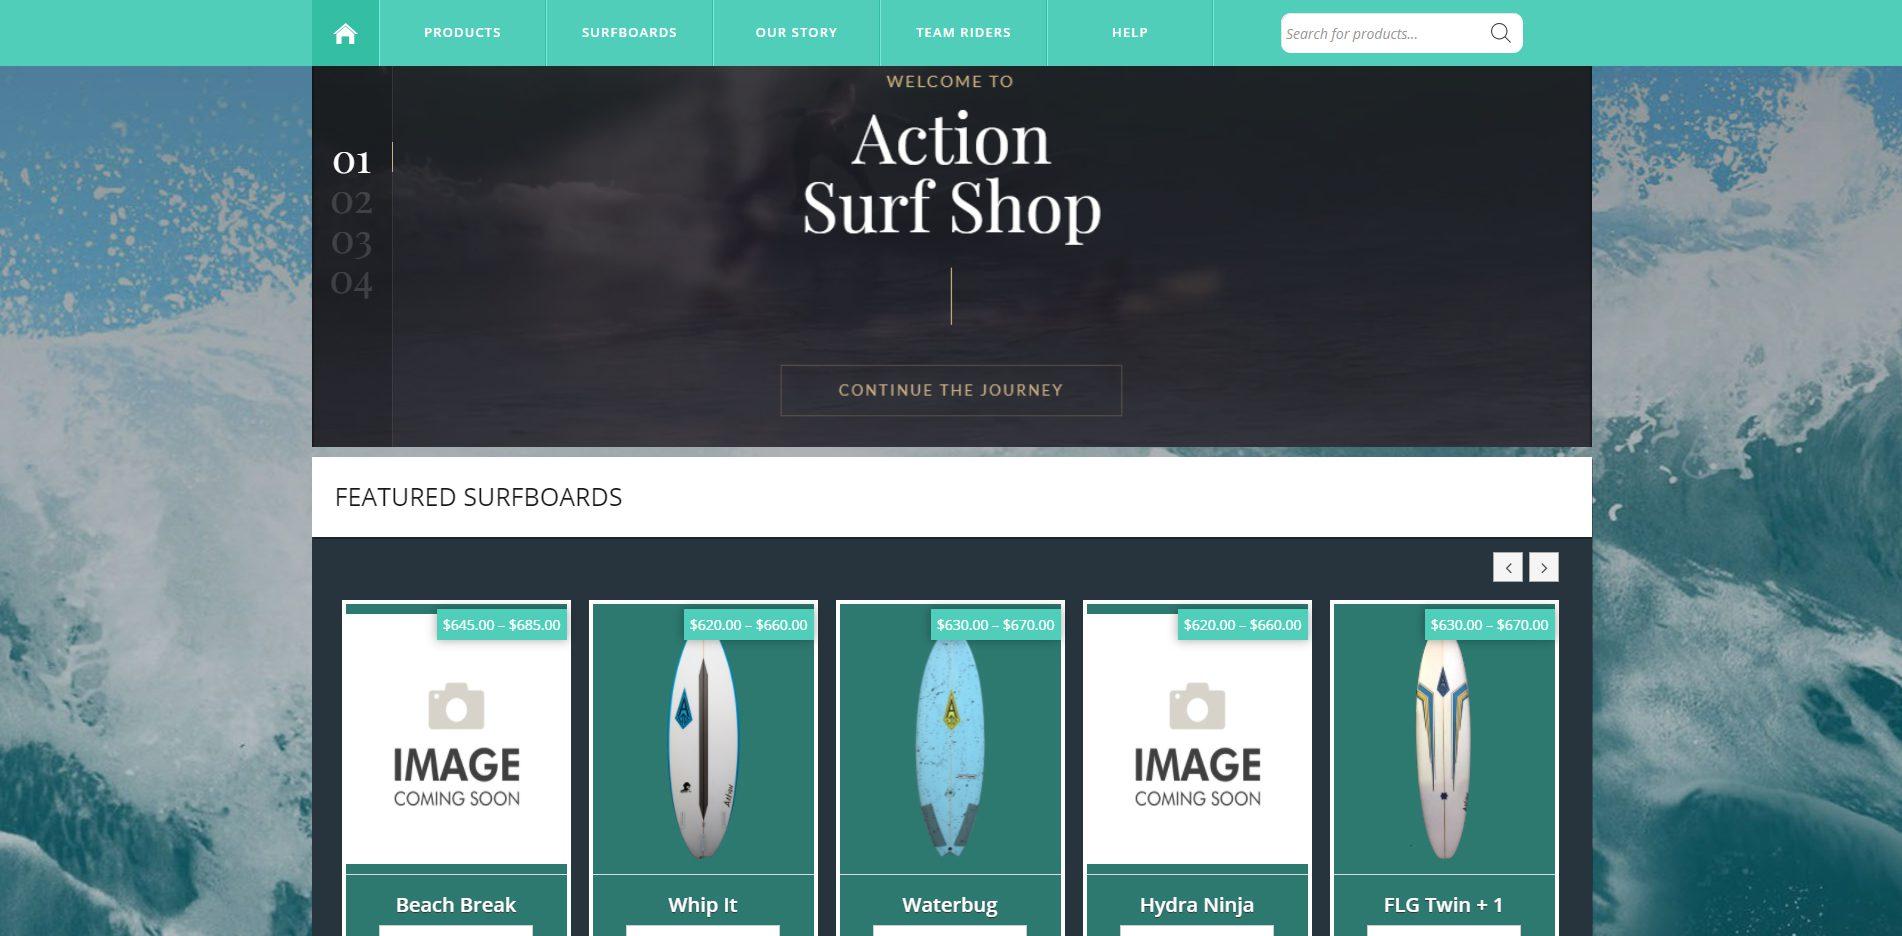 Action SurfShop